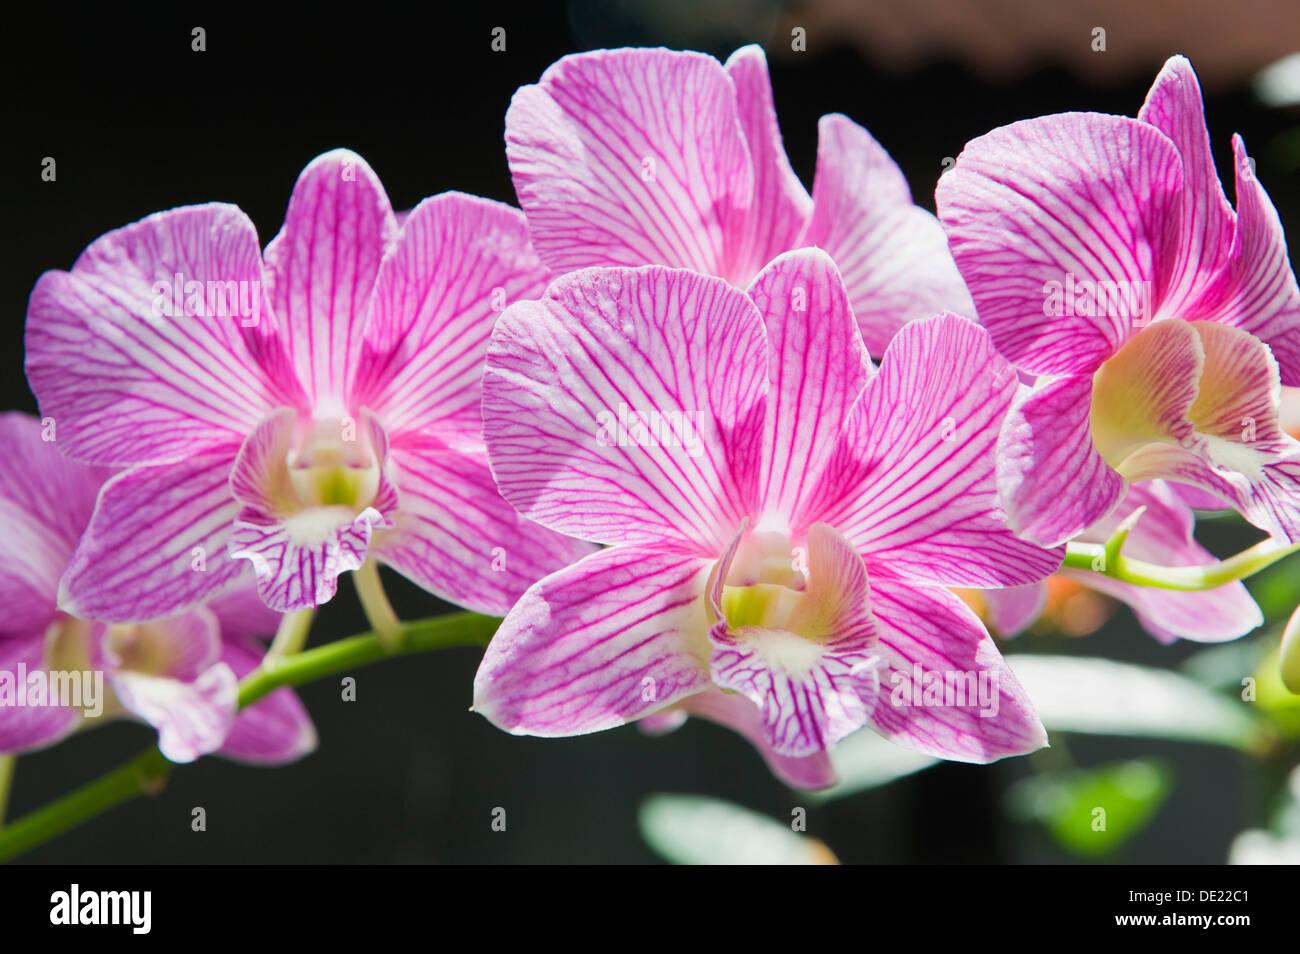 Orchid flowers (Orchidaceae), Ubud, Bali, Indonesia - Stock Image